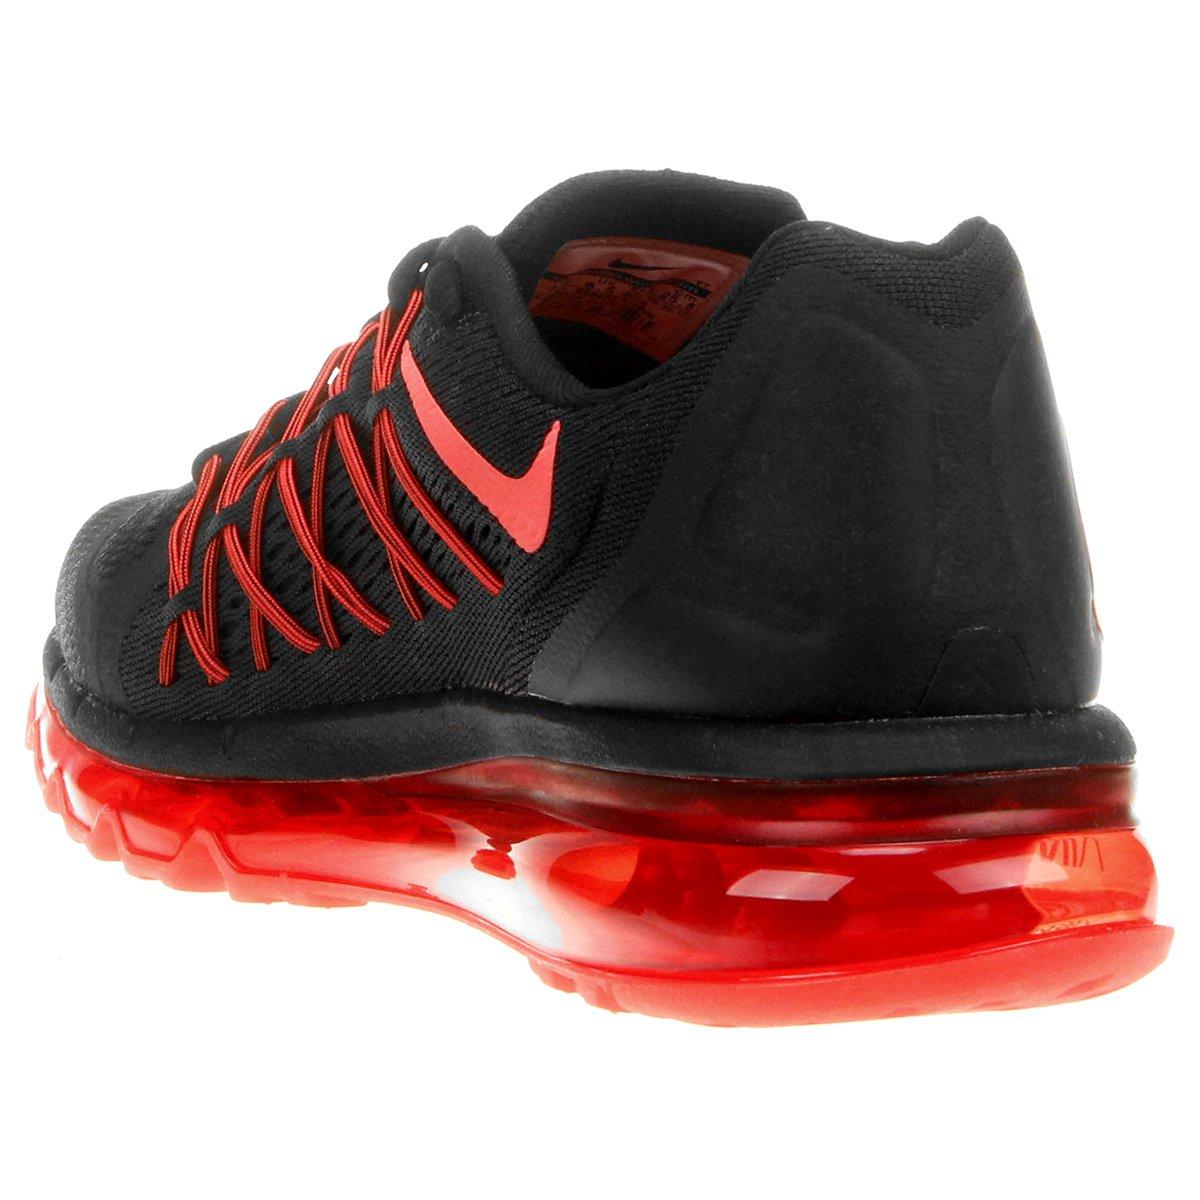 8bffd6f8897 ... Tênis Nike Air Max 2015 Masculino - Vermelho e Preto ...